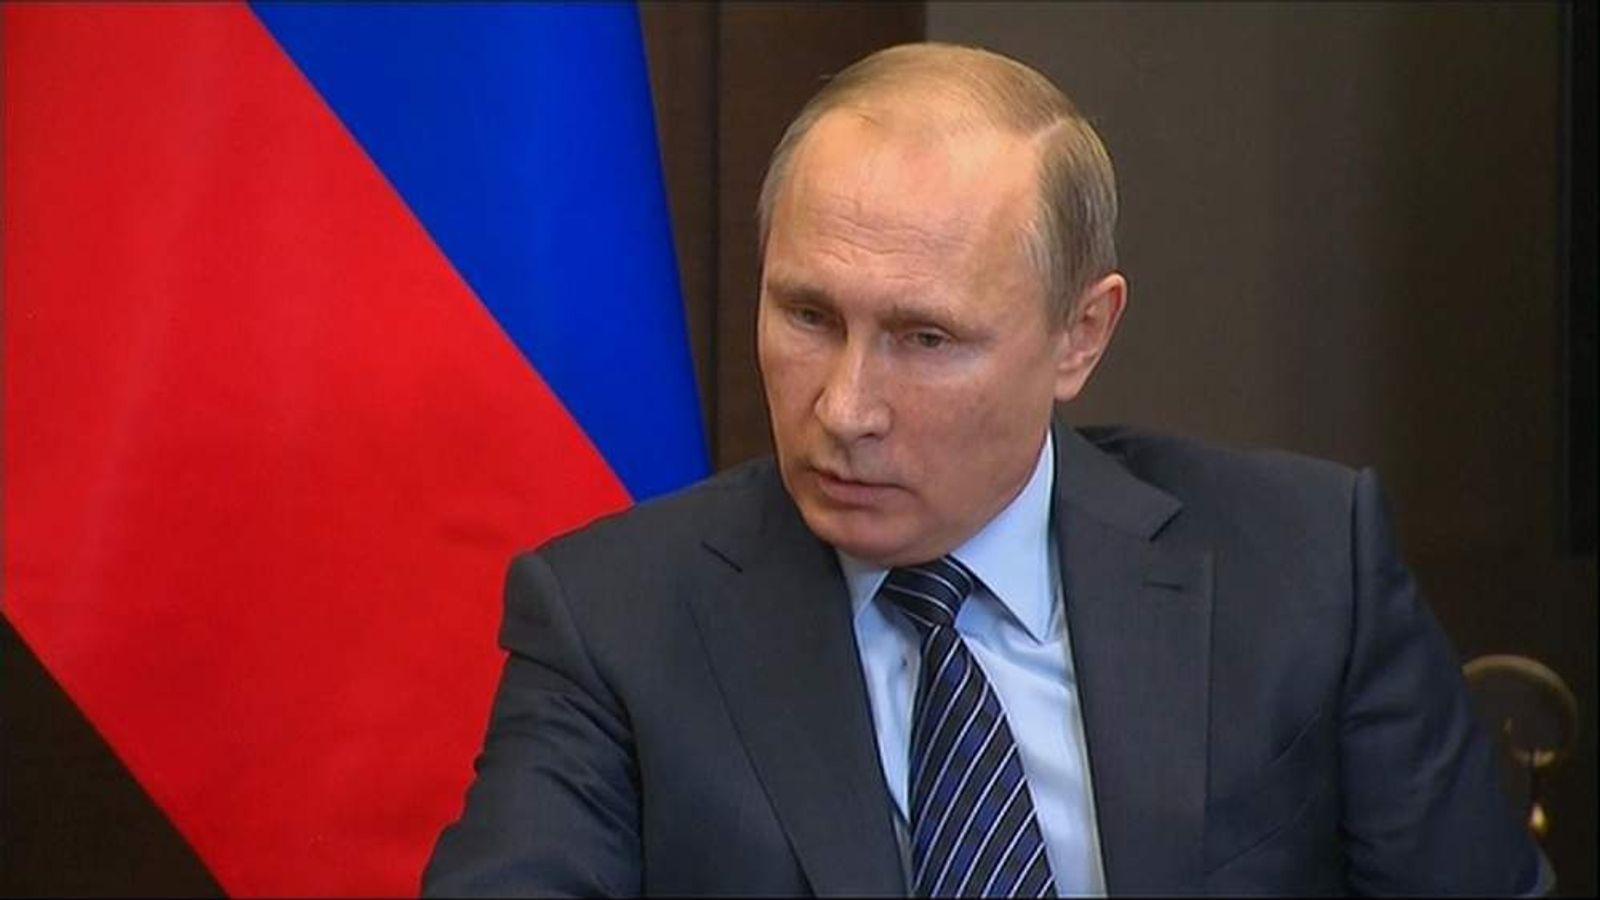 241115 Putin Statement Turkey Jet